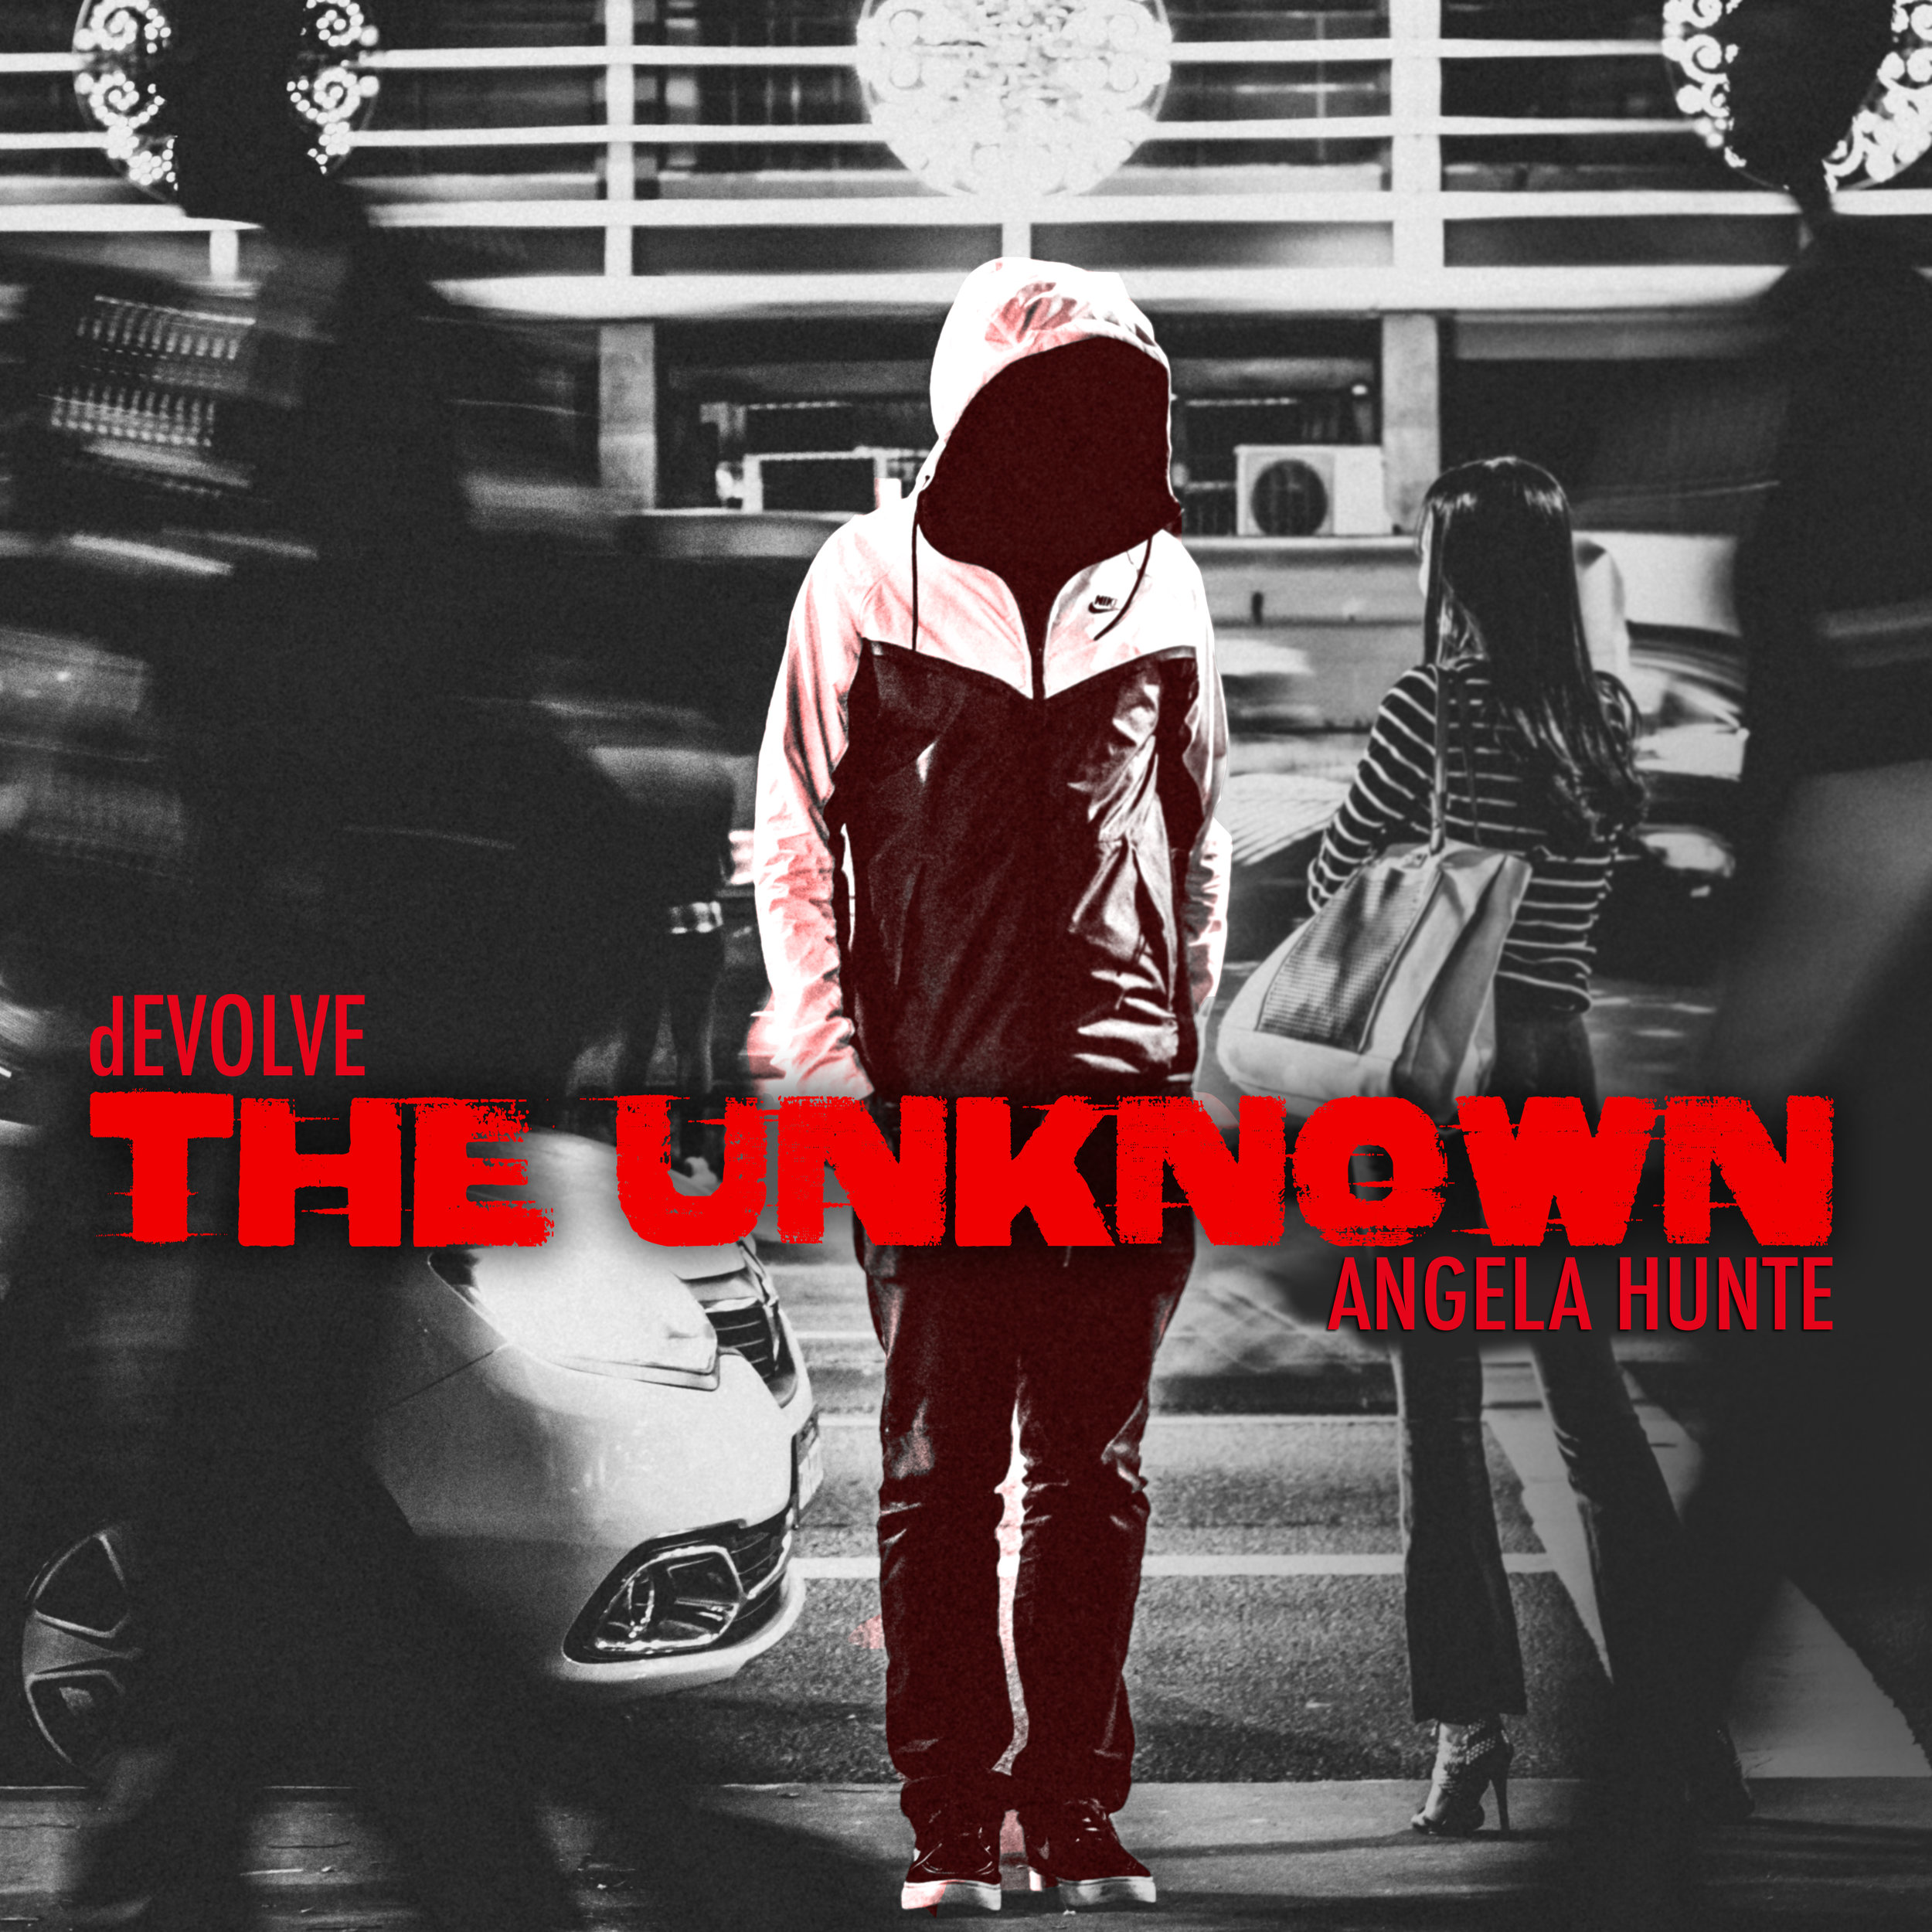 The-Unknown-1.jpg